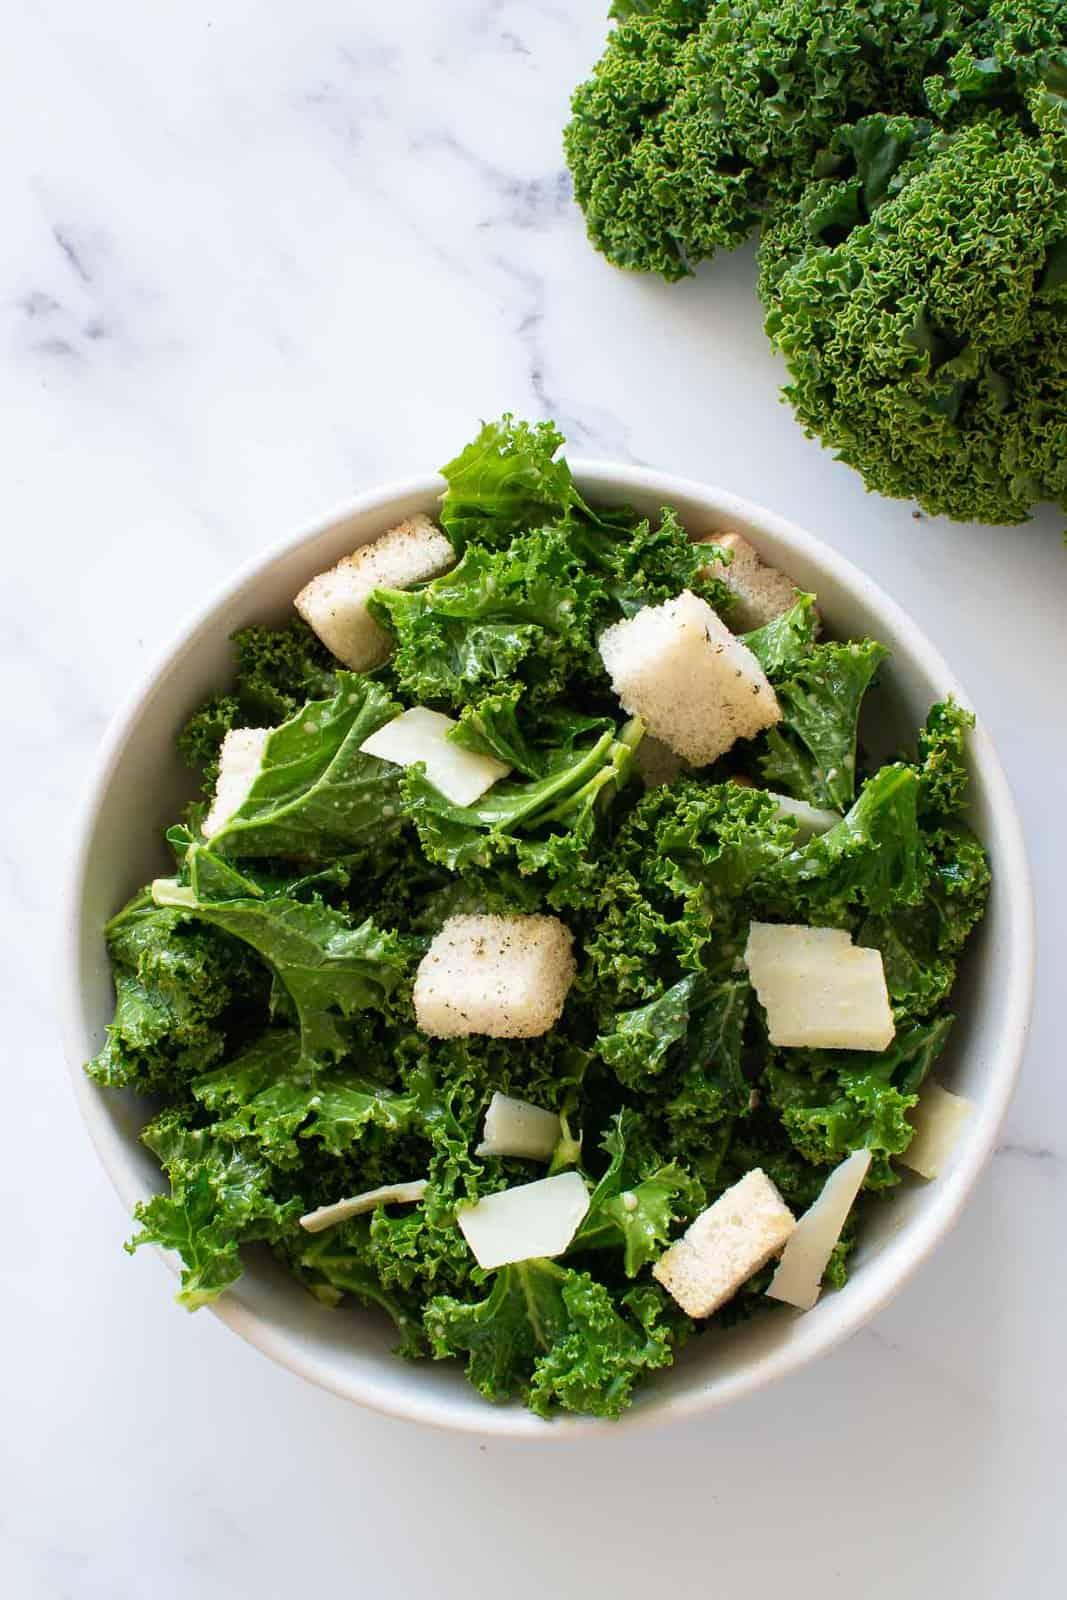 A bowl of kale salad with lemon dressing, croutons and Parmesan.